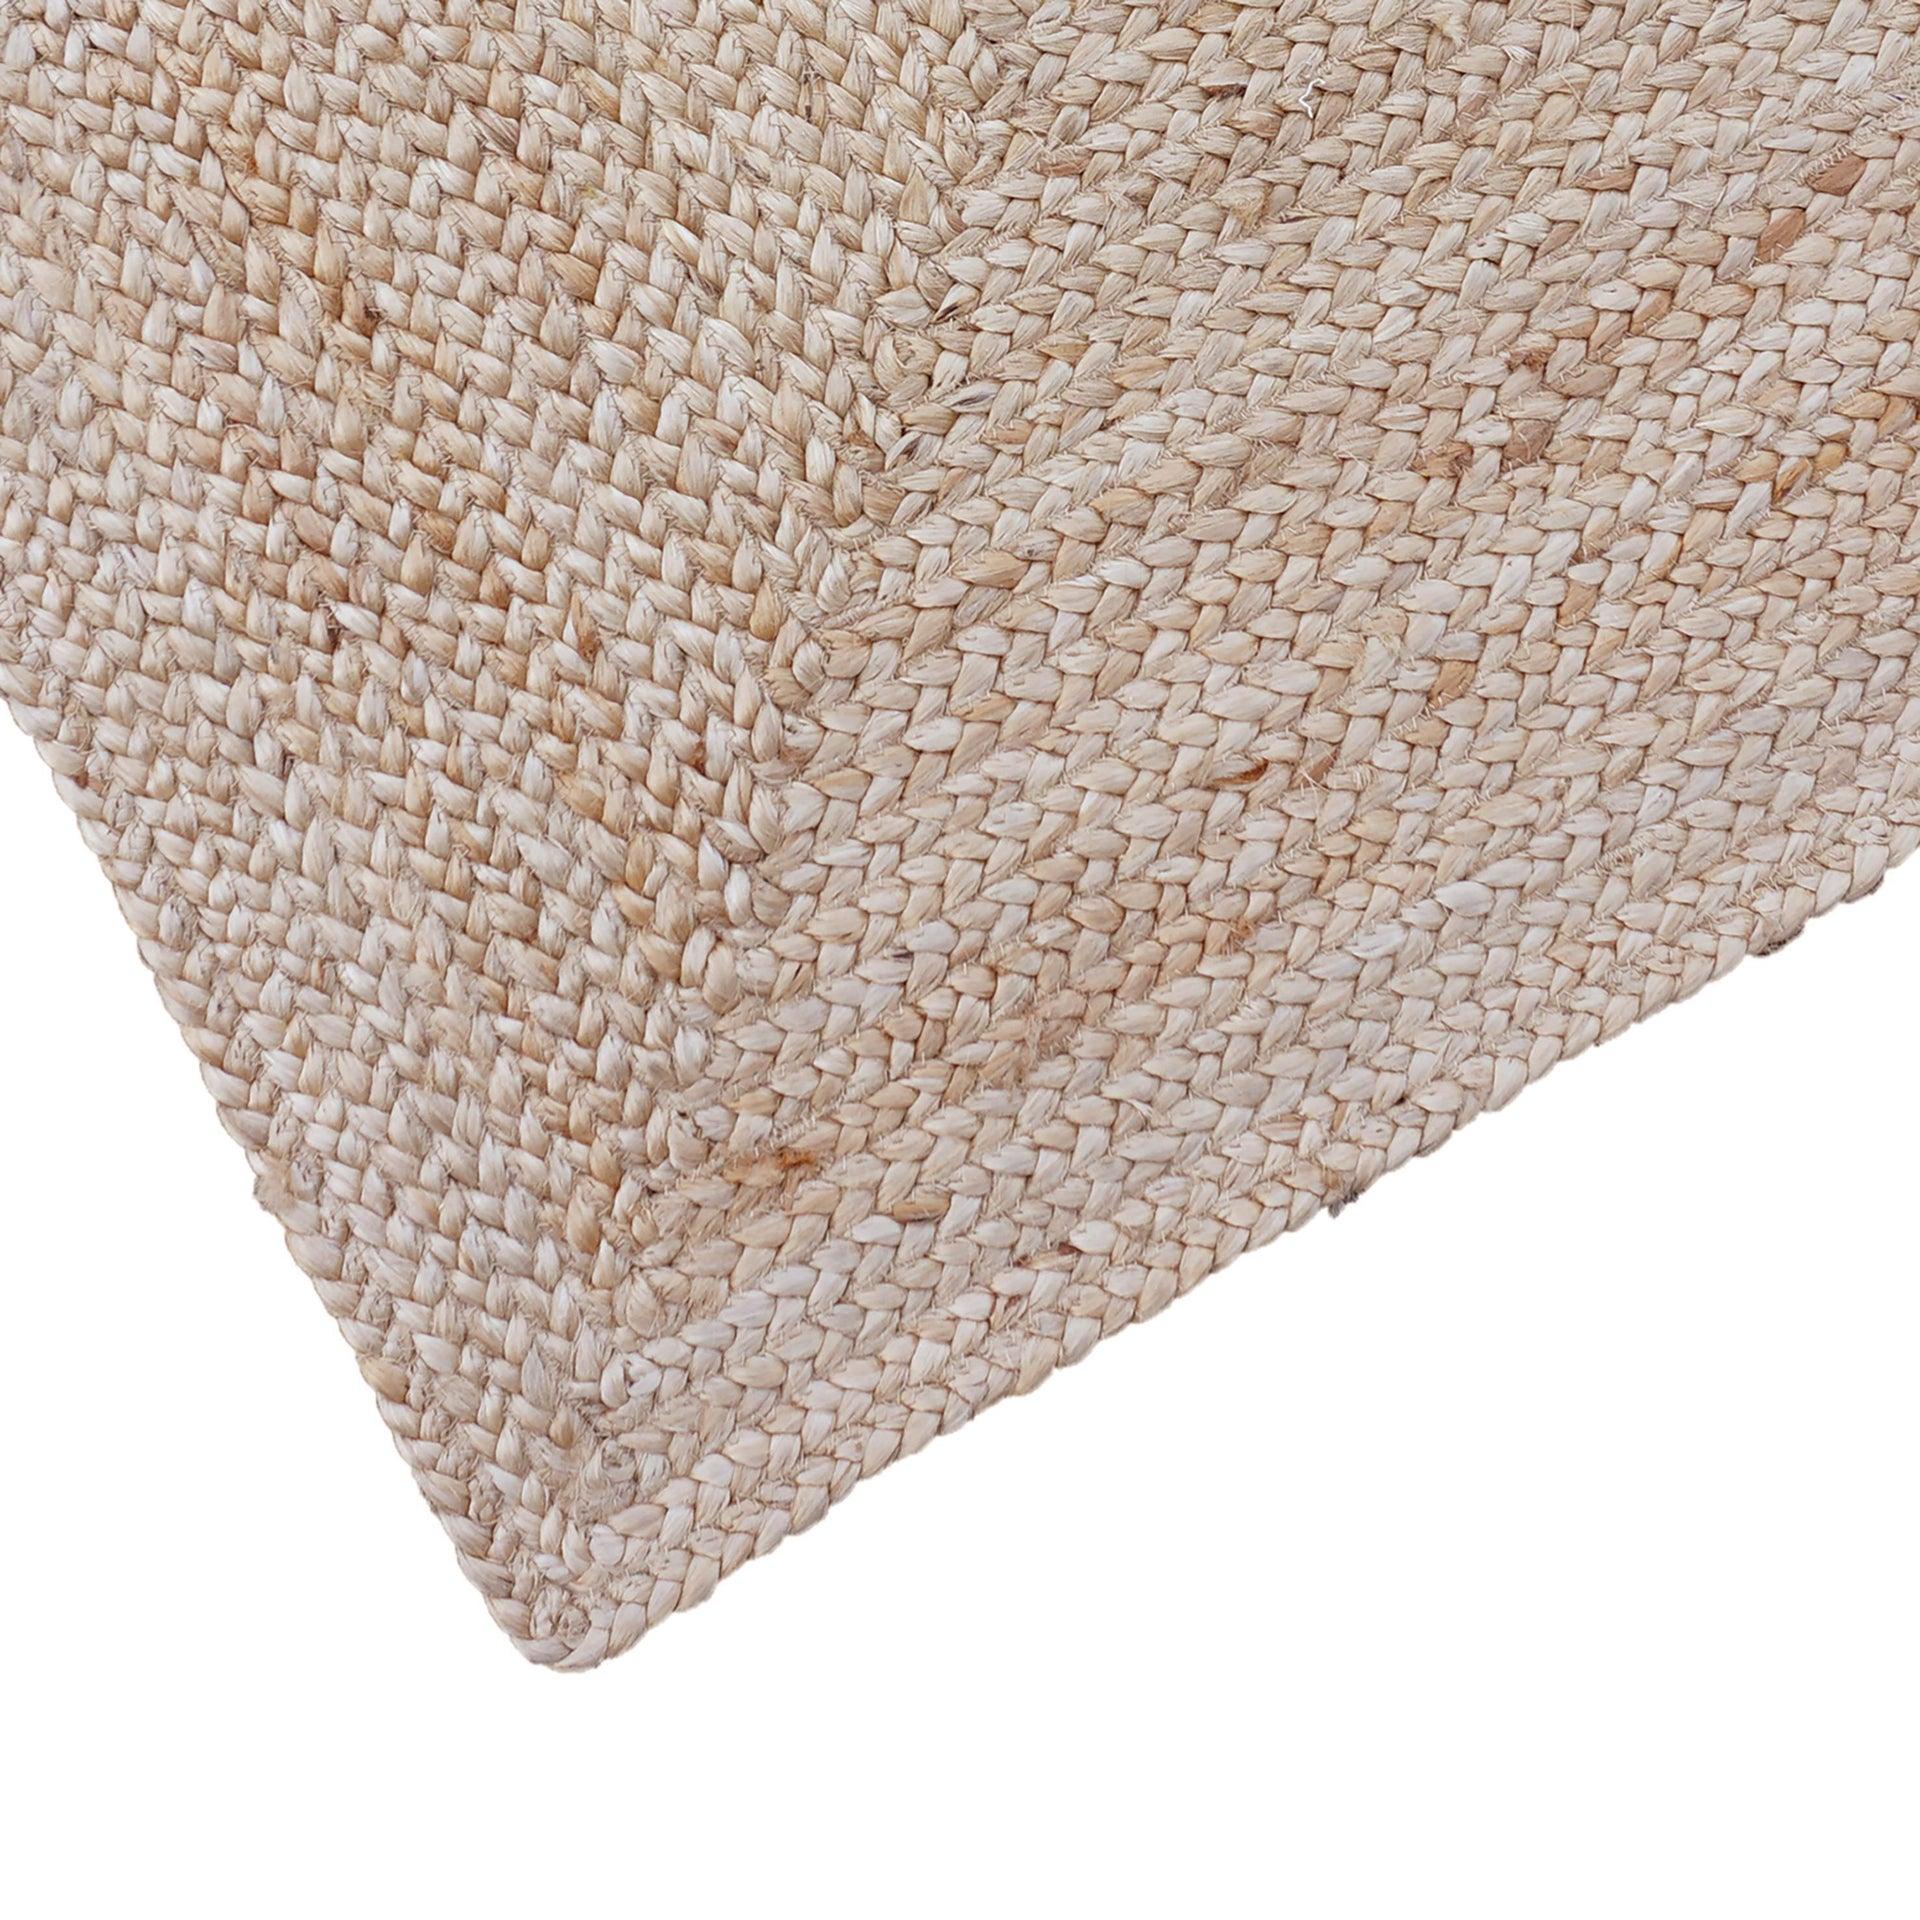 Tappeto Nils in juta, tessuto a mano, naturale, 60x110 - 3